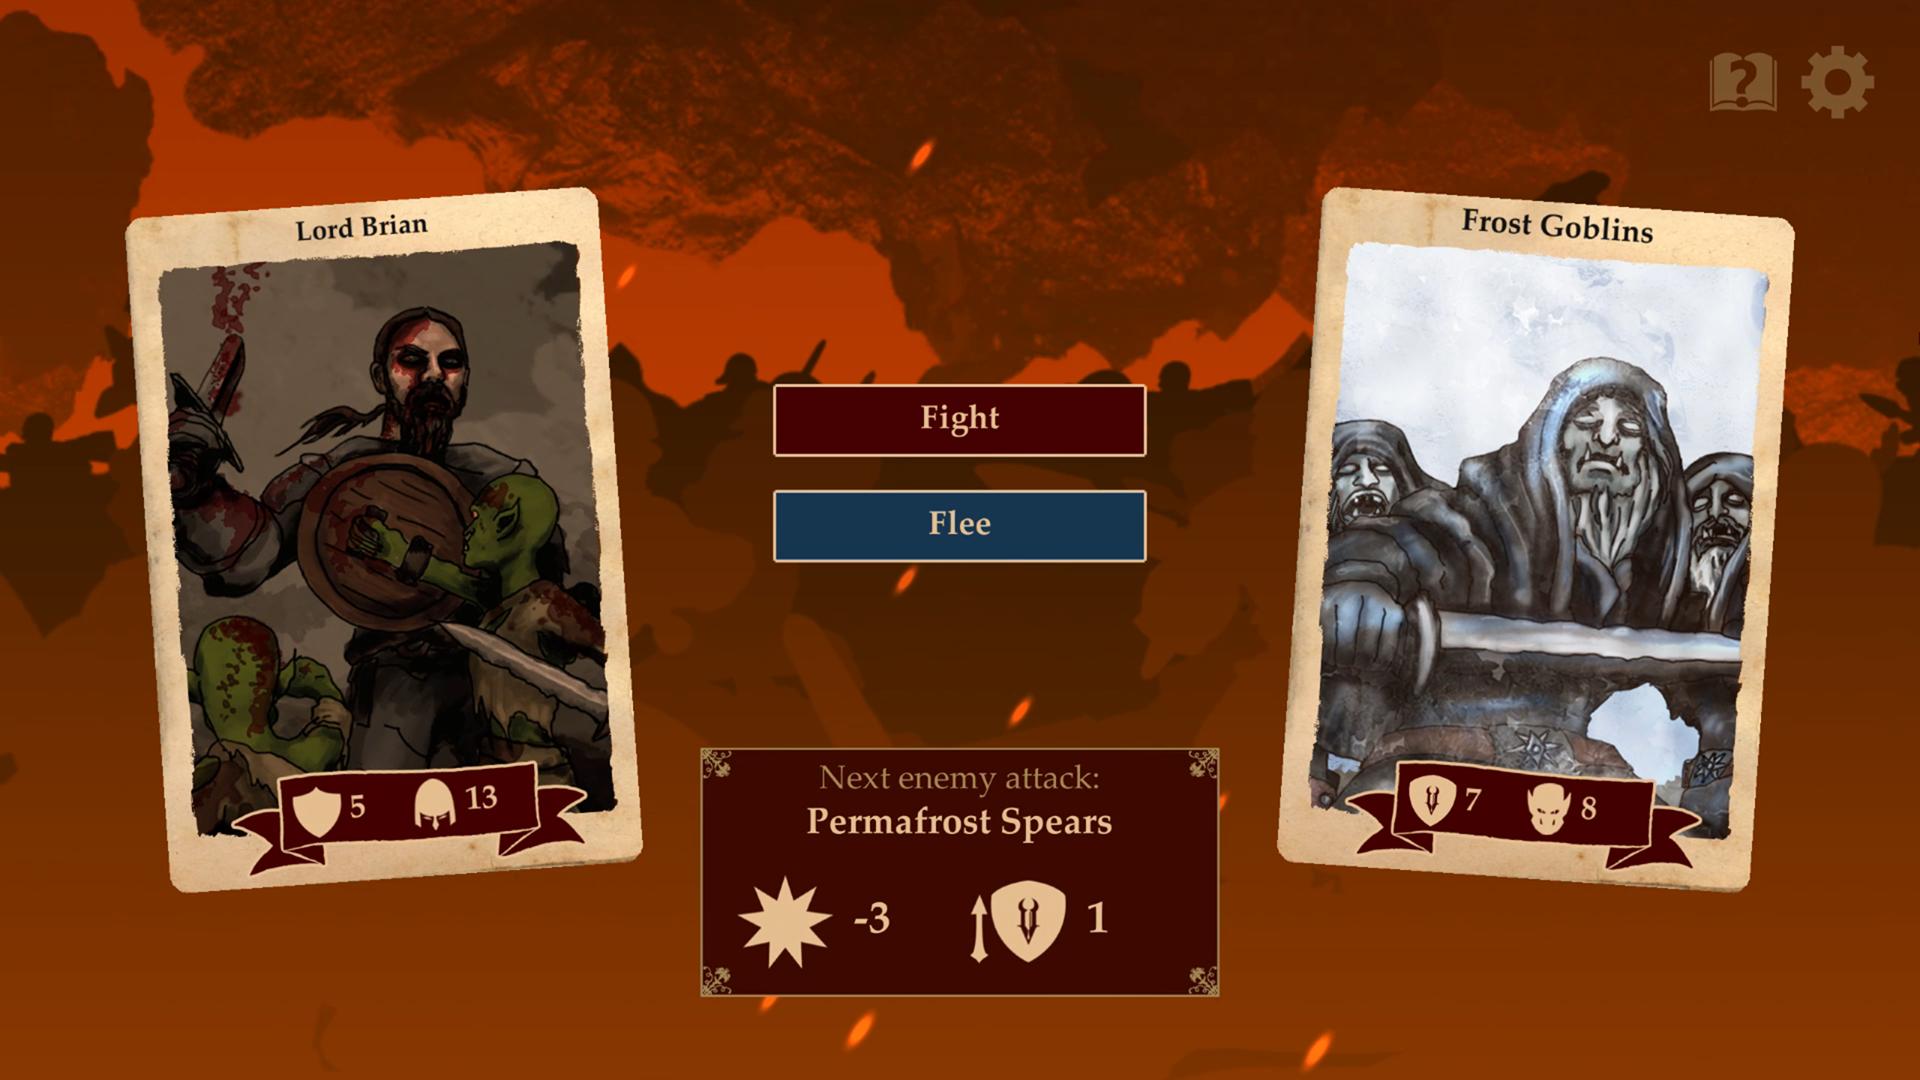 Vulgord's Tower Battle Frost Goblins